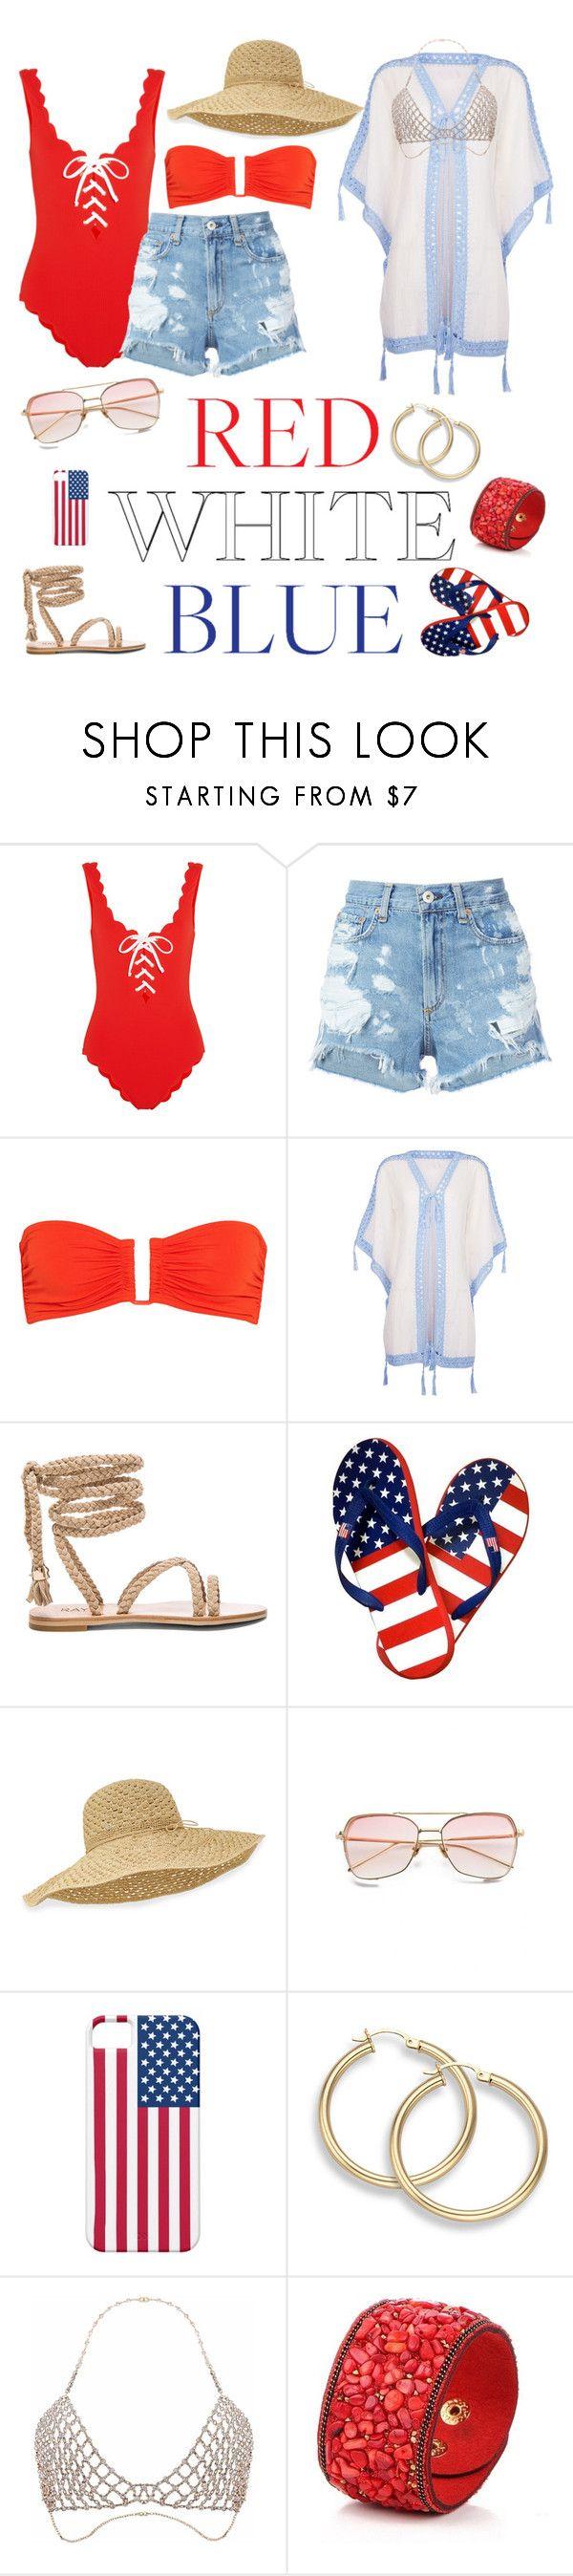 """Pool Party in the USA"" by stoofanie ❤ liked on Polyvore featuring Marysia Swim, rag & bone/JEAN, Eres, Anna Kosturova and Helen Kaminski"